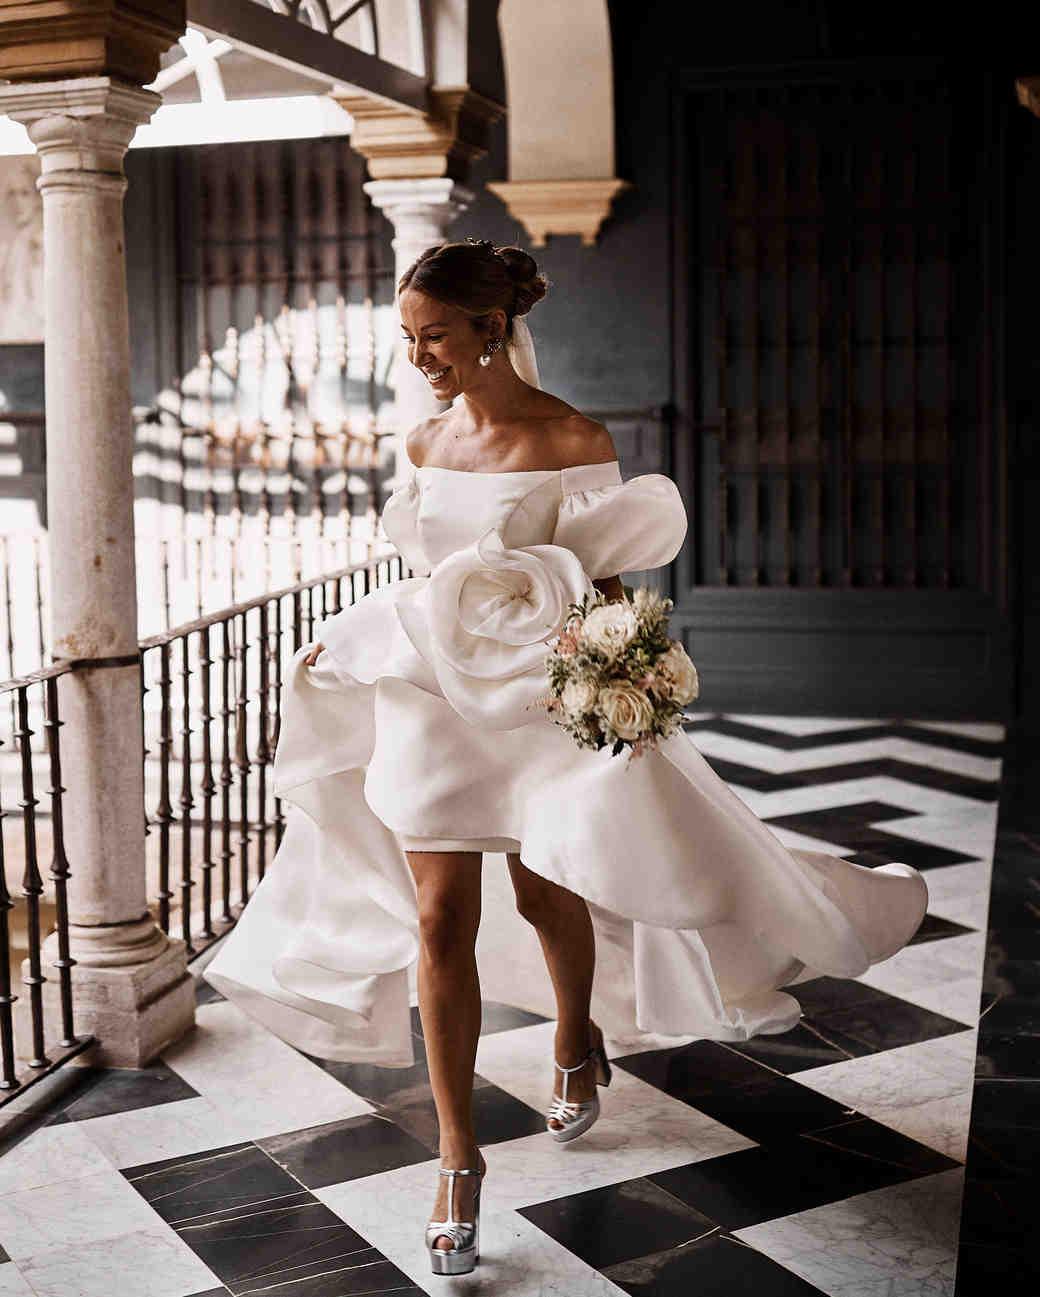 karolina sorab wedding bride fashion dress